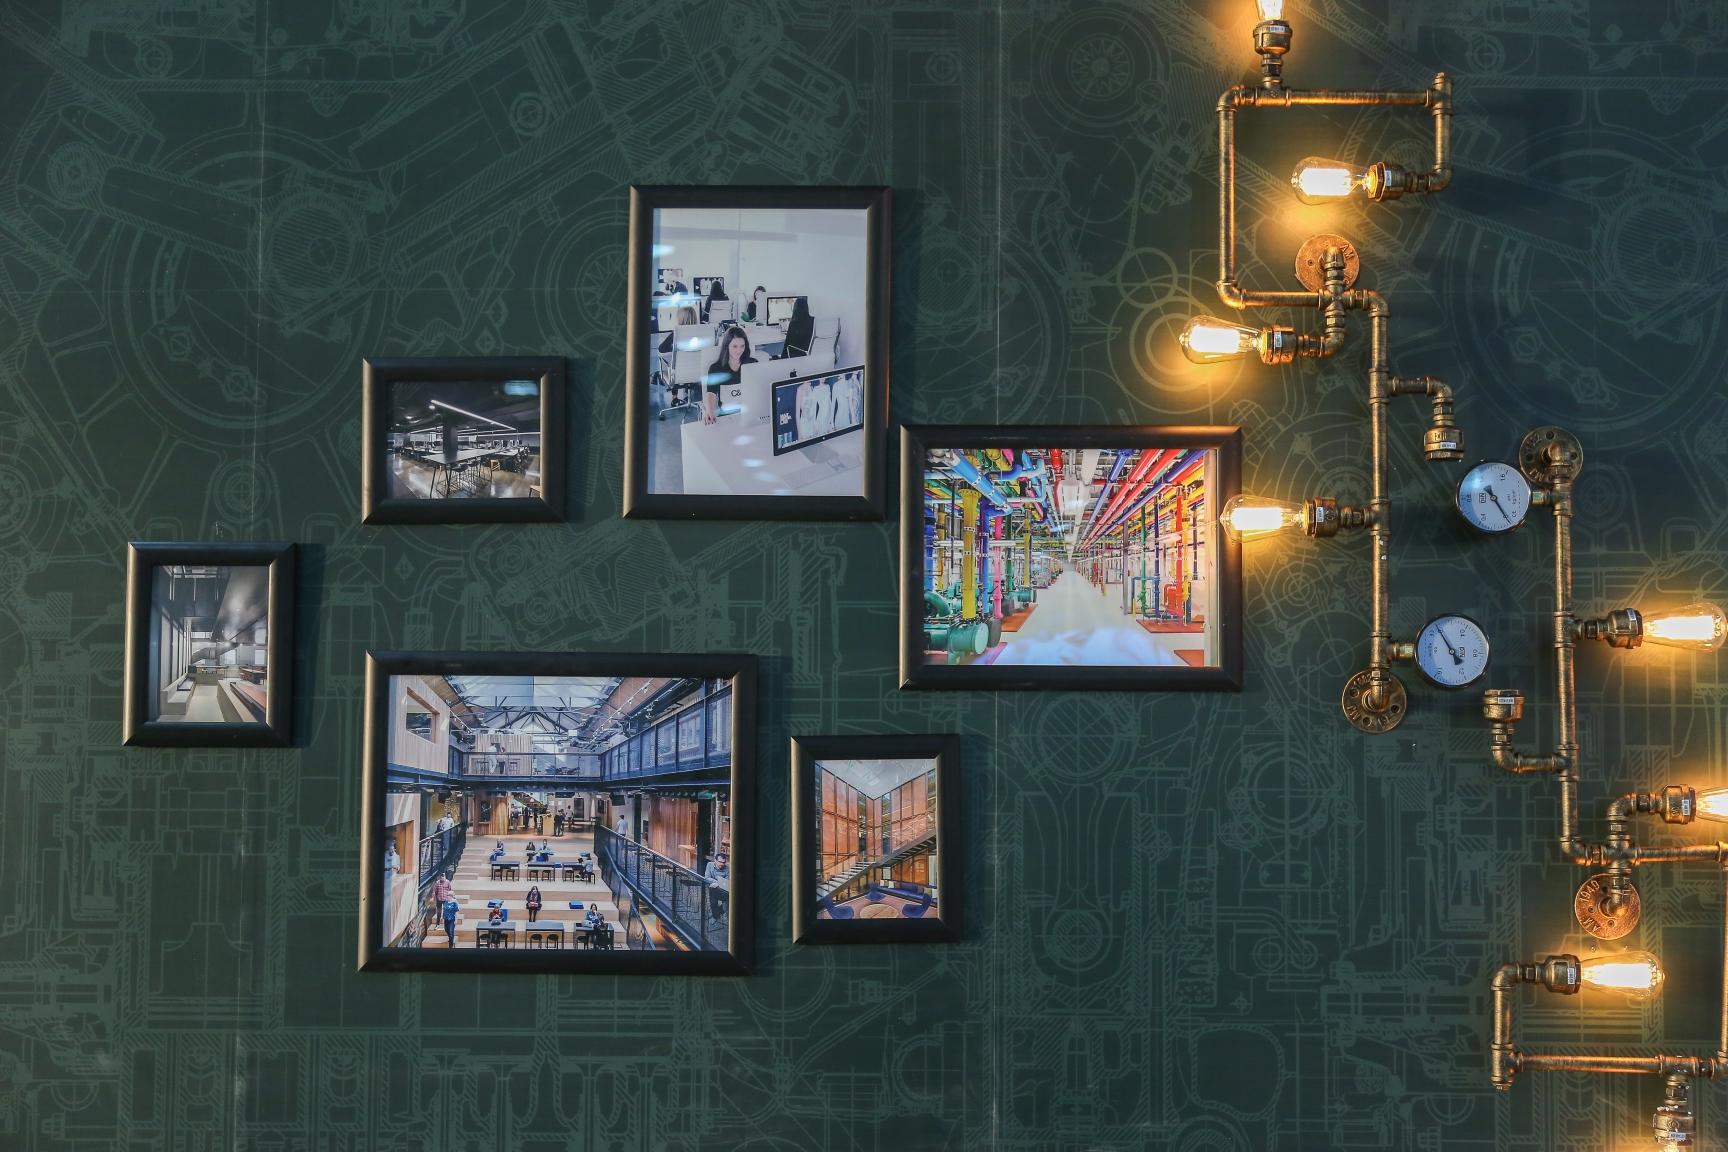 Une d co urbaine mode d 39 emploi blog masculin for Decoration murale urbaine